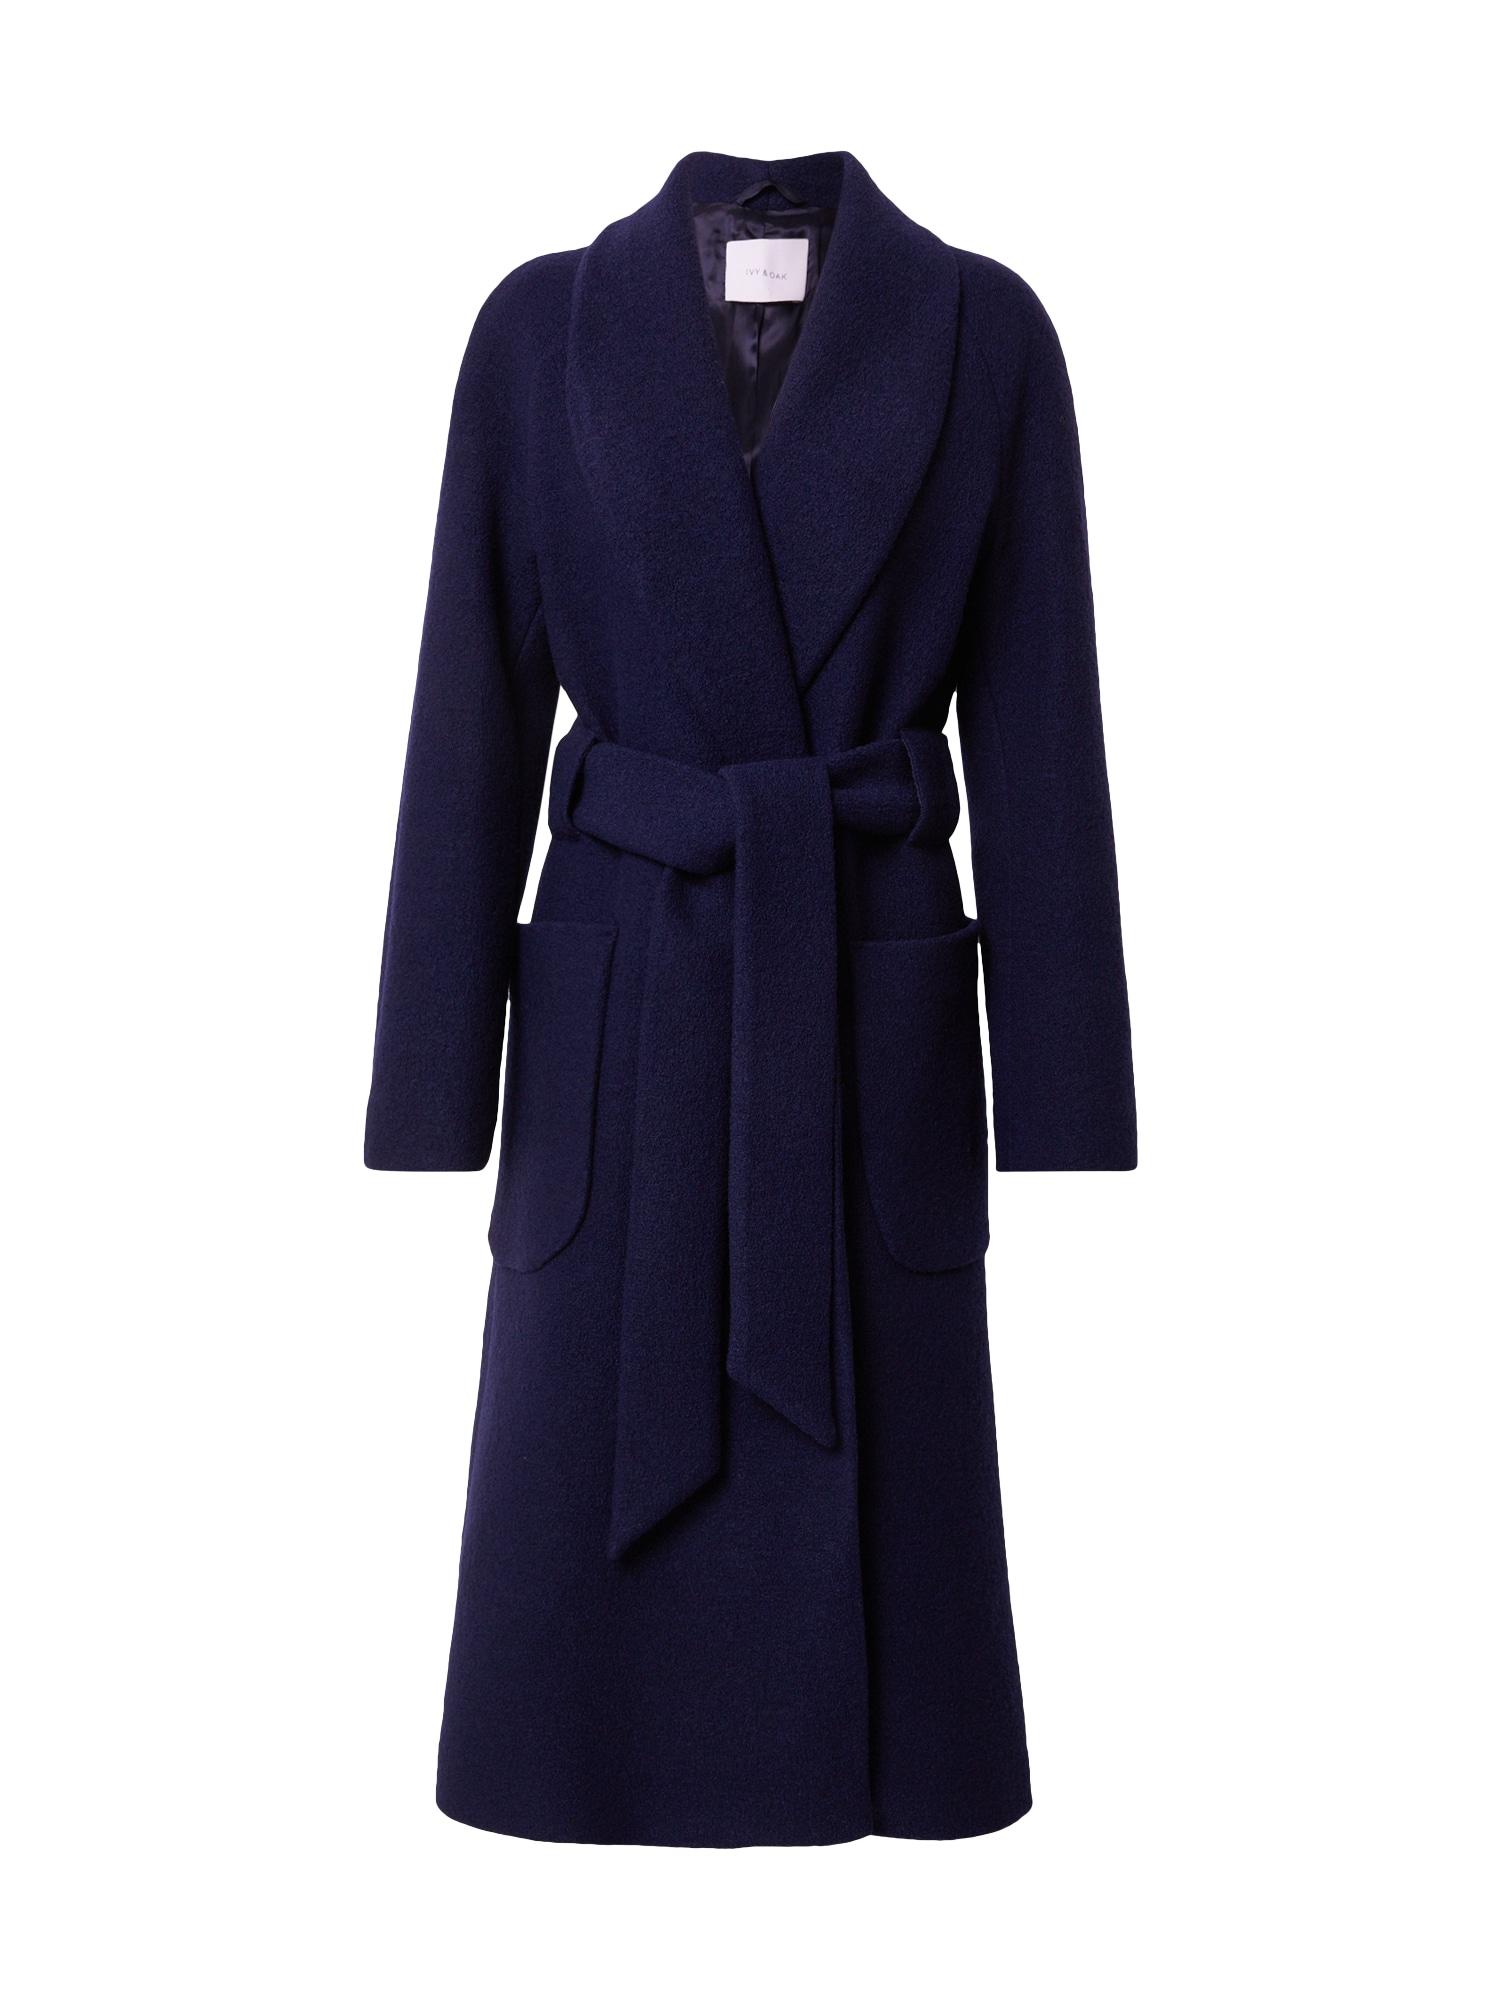 IVY & OAK Demisezoninis paltas mėlyna